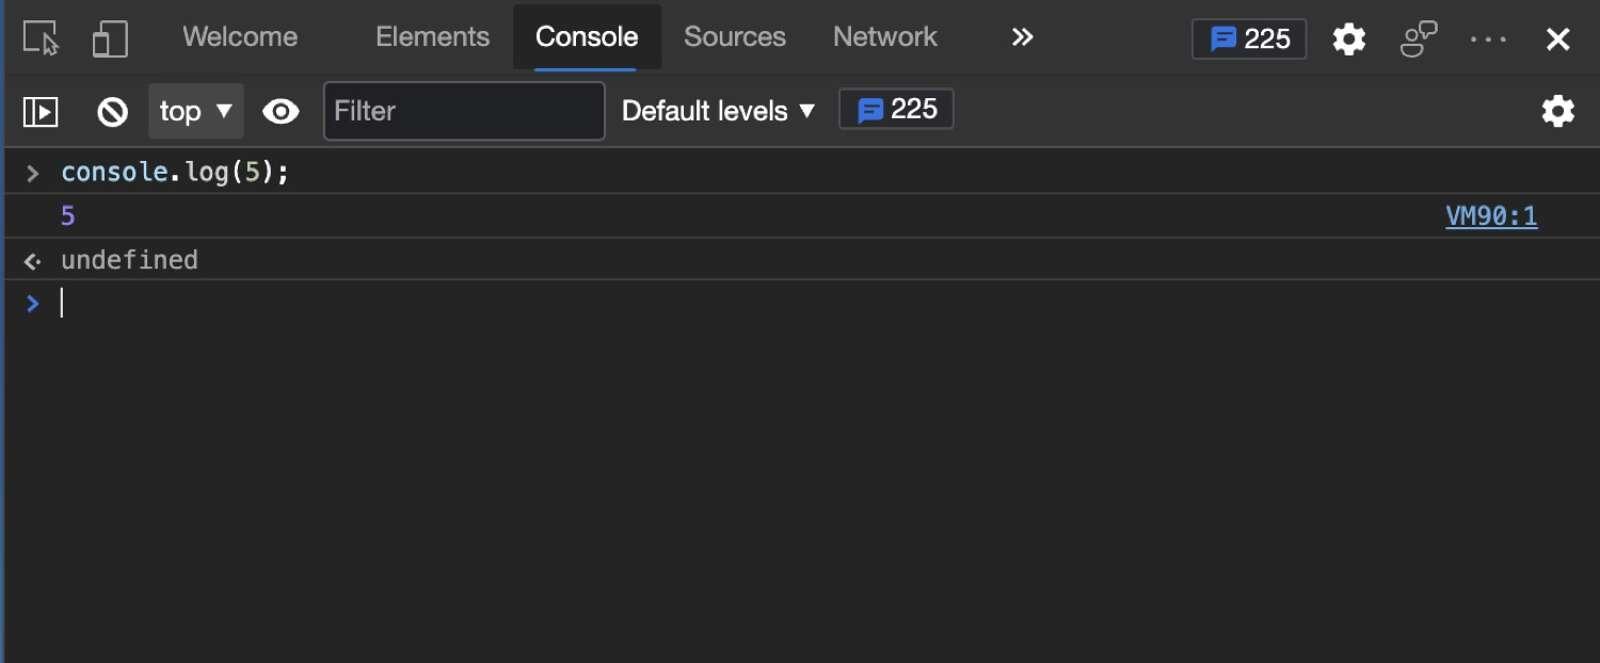 JavaScript Console in Microsoft Edge browser